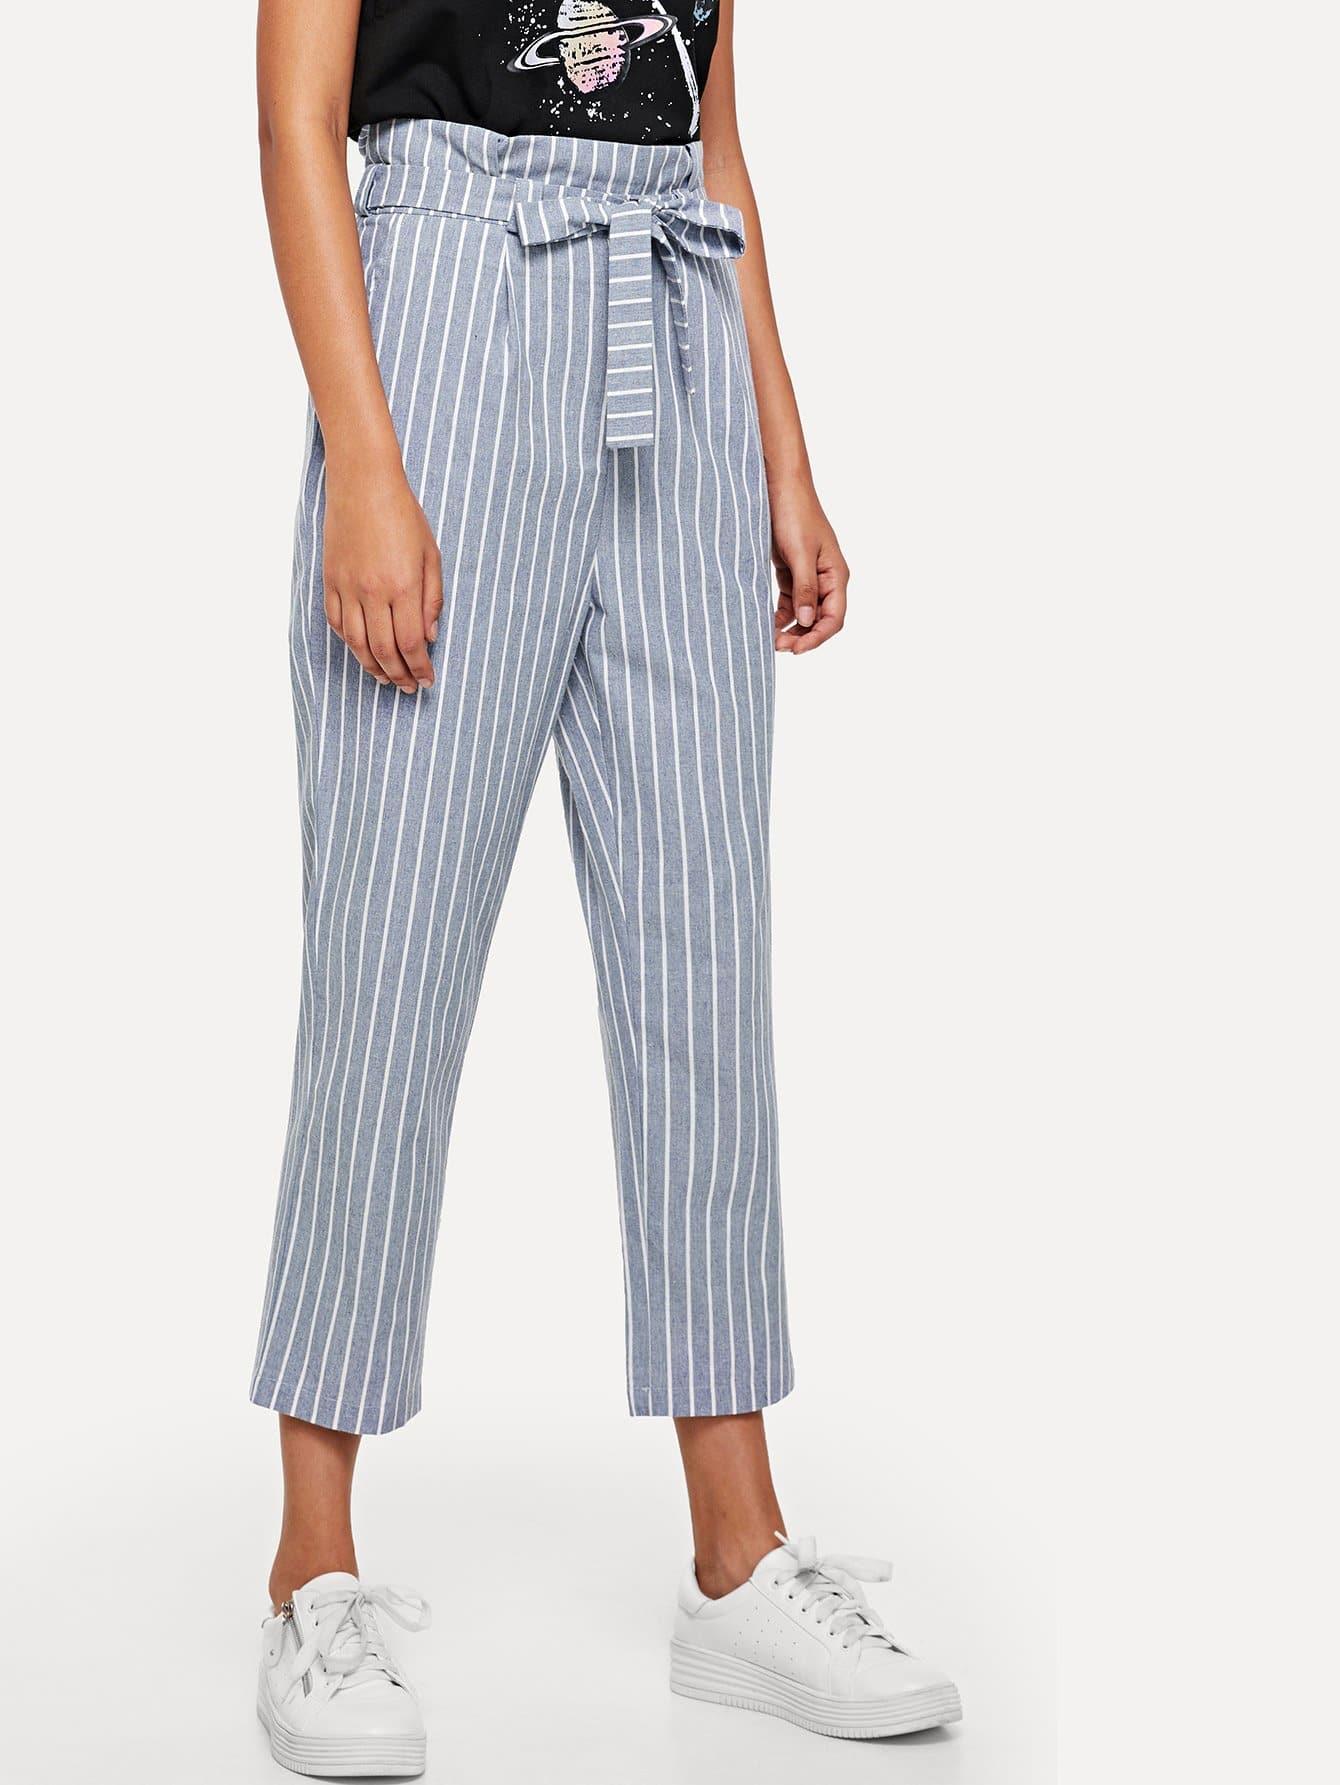 Cuffed Leg Belted Pinstripe Pants solid cuffed pants